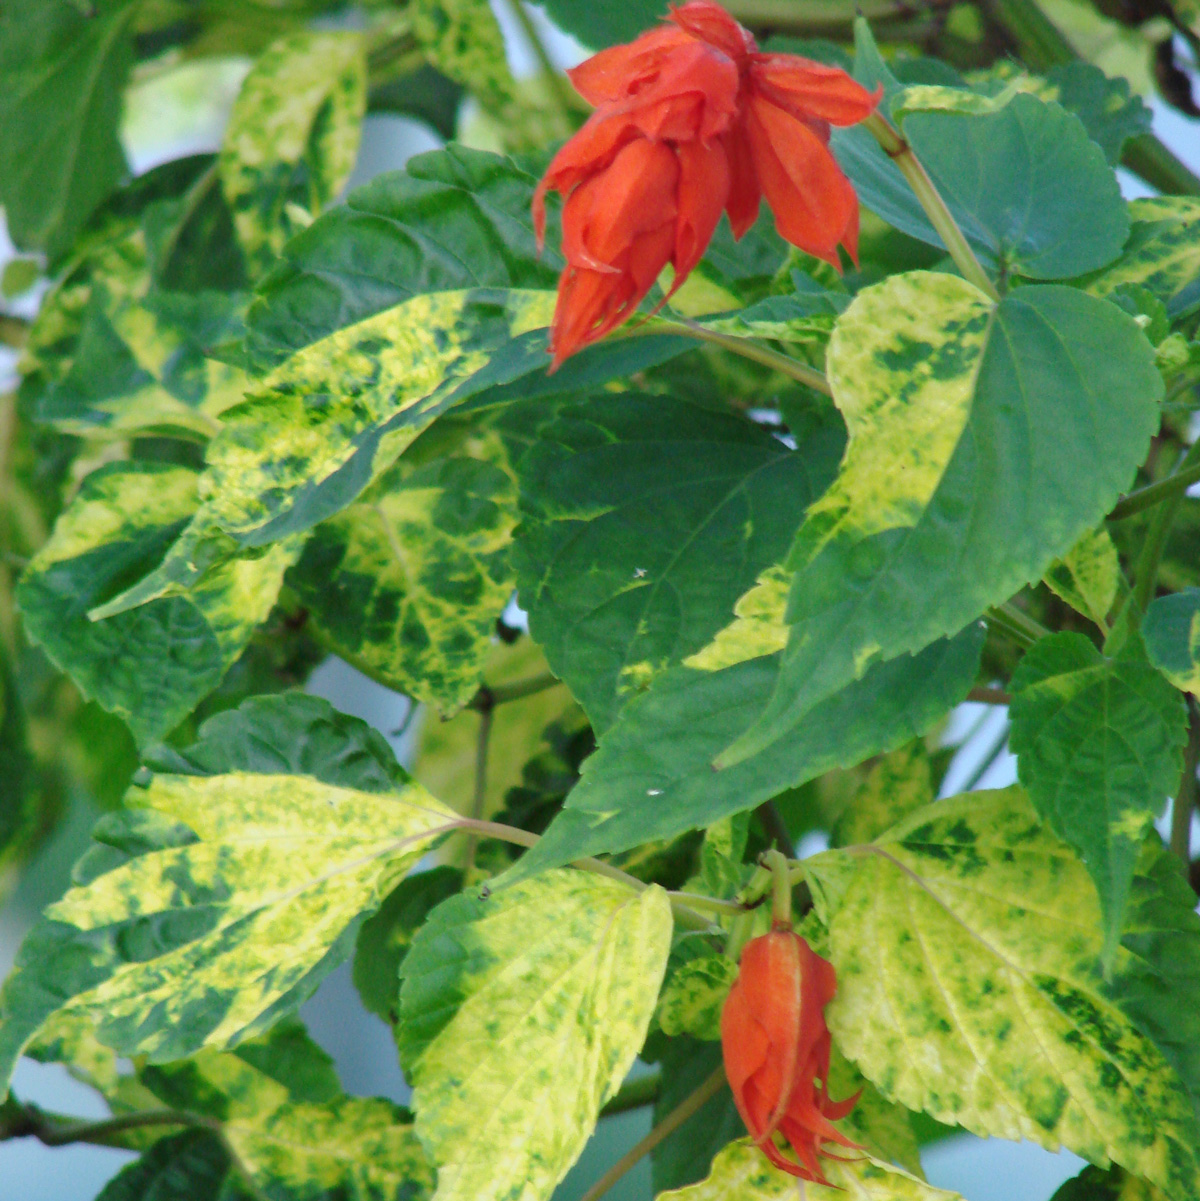 Salvia splendens van houttei 'Dancing Flame' width=